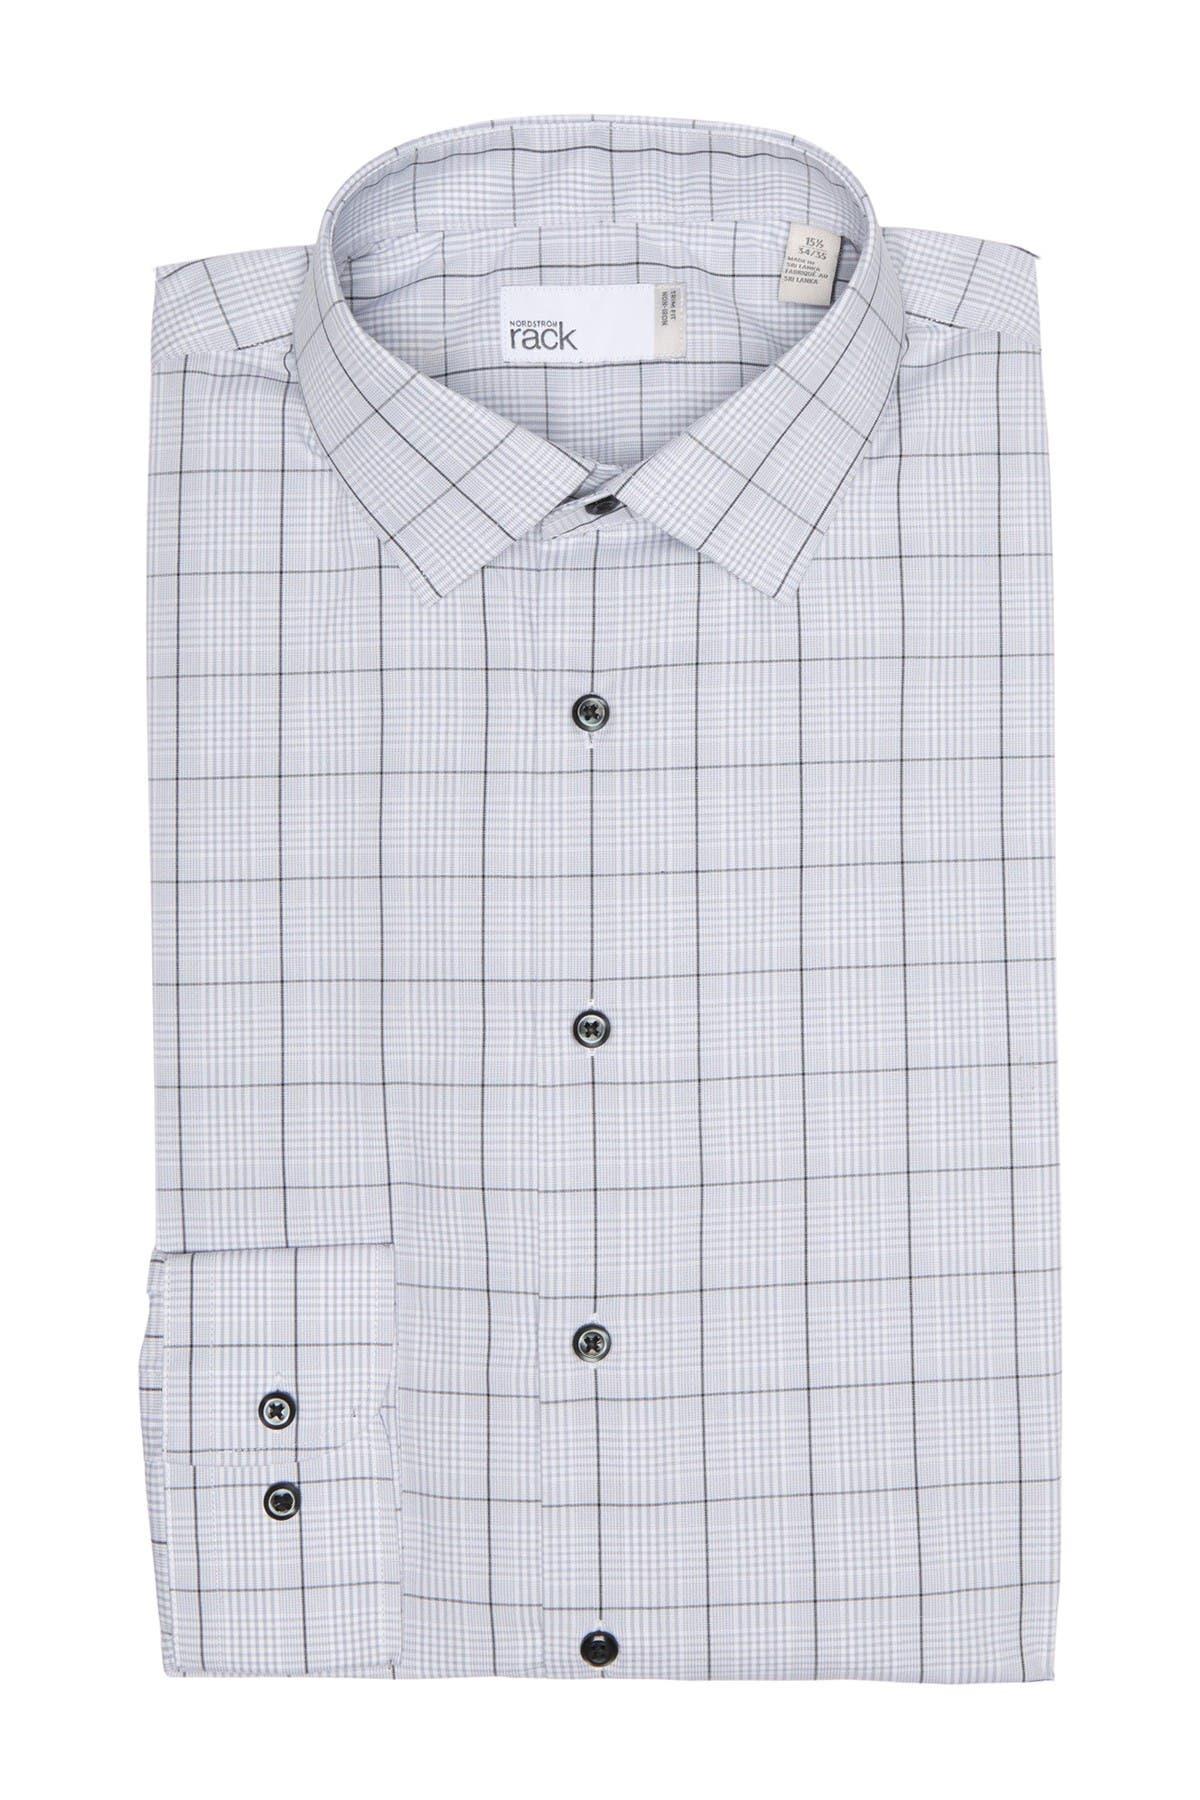 Image of Nordstrom Rack Plaid Non-Iron Trim Fit Dress Shirt